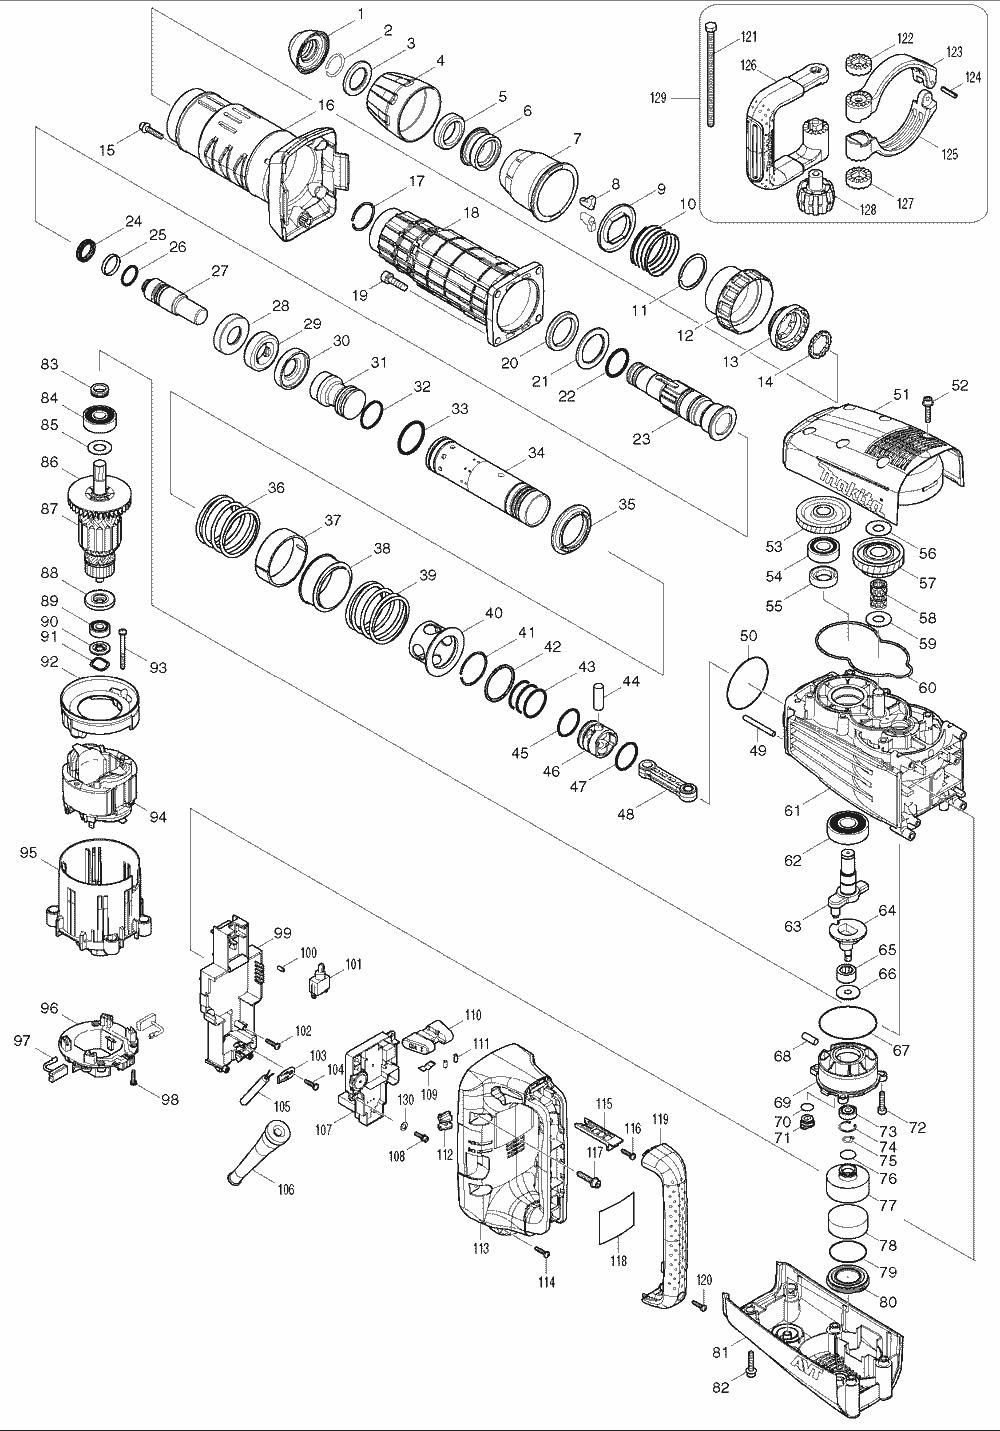 Buy Makita Hm1214c 27 Lb Avt Sds Max Replacement Tool Parts Wilton D6 List And Diagram Ereplacementpartscom Schematic